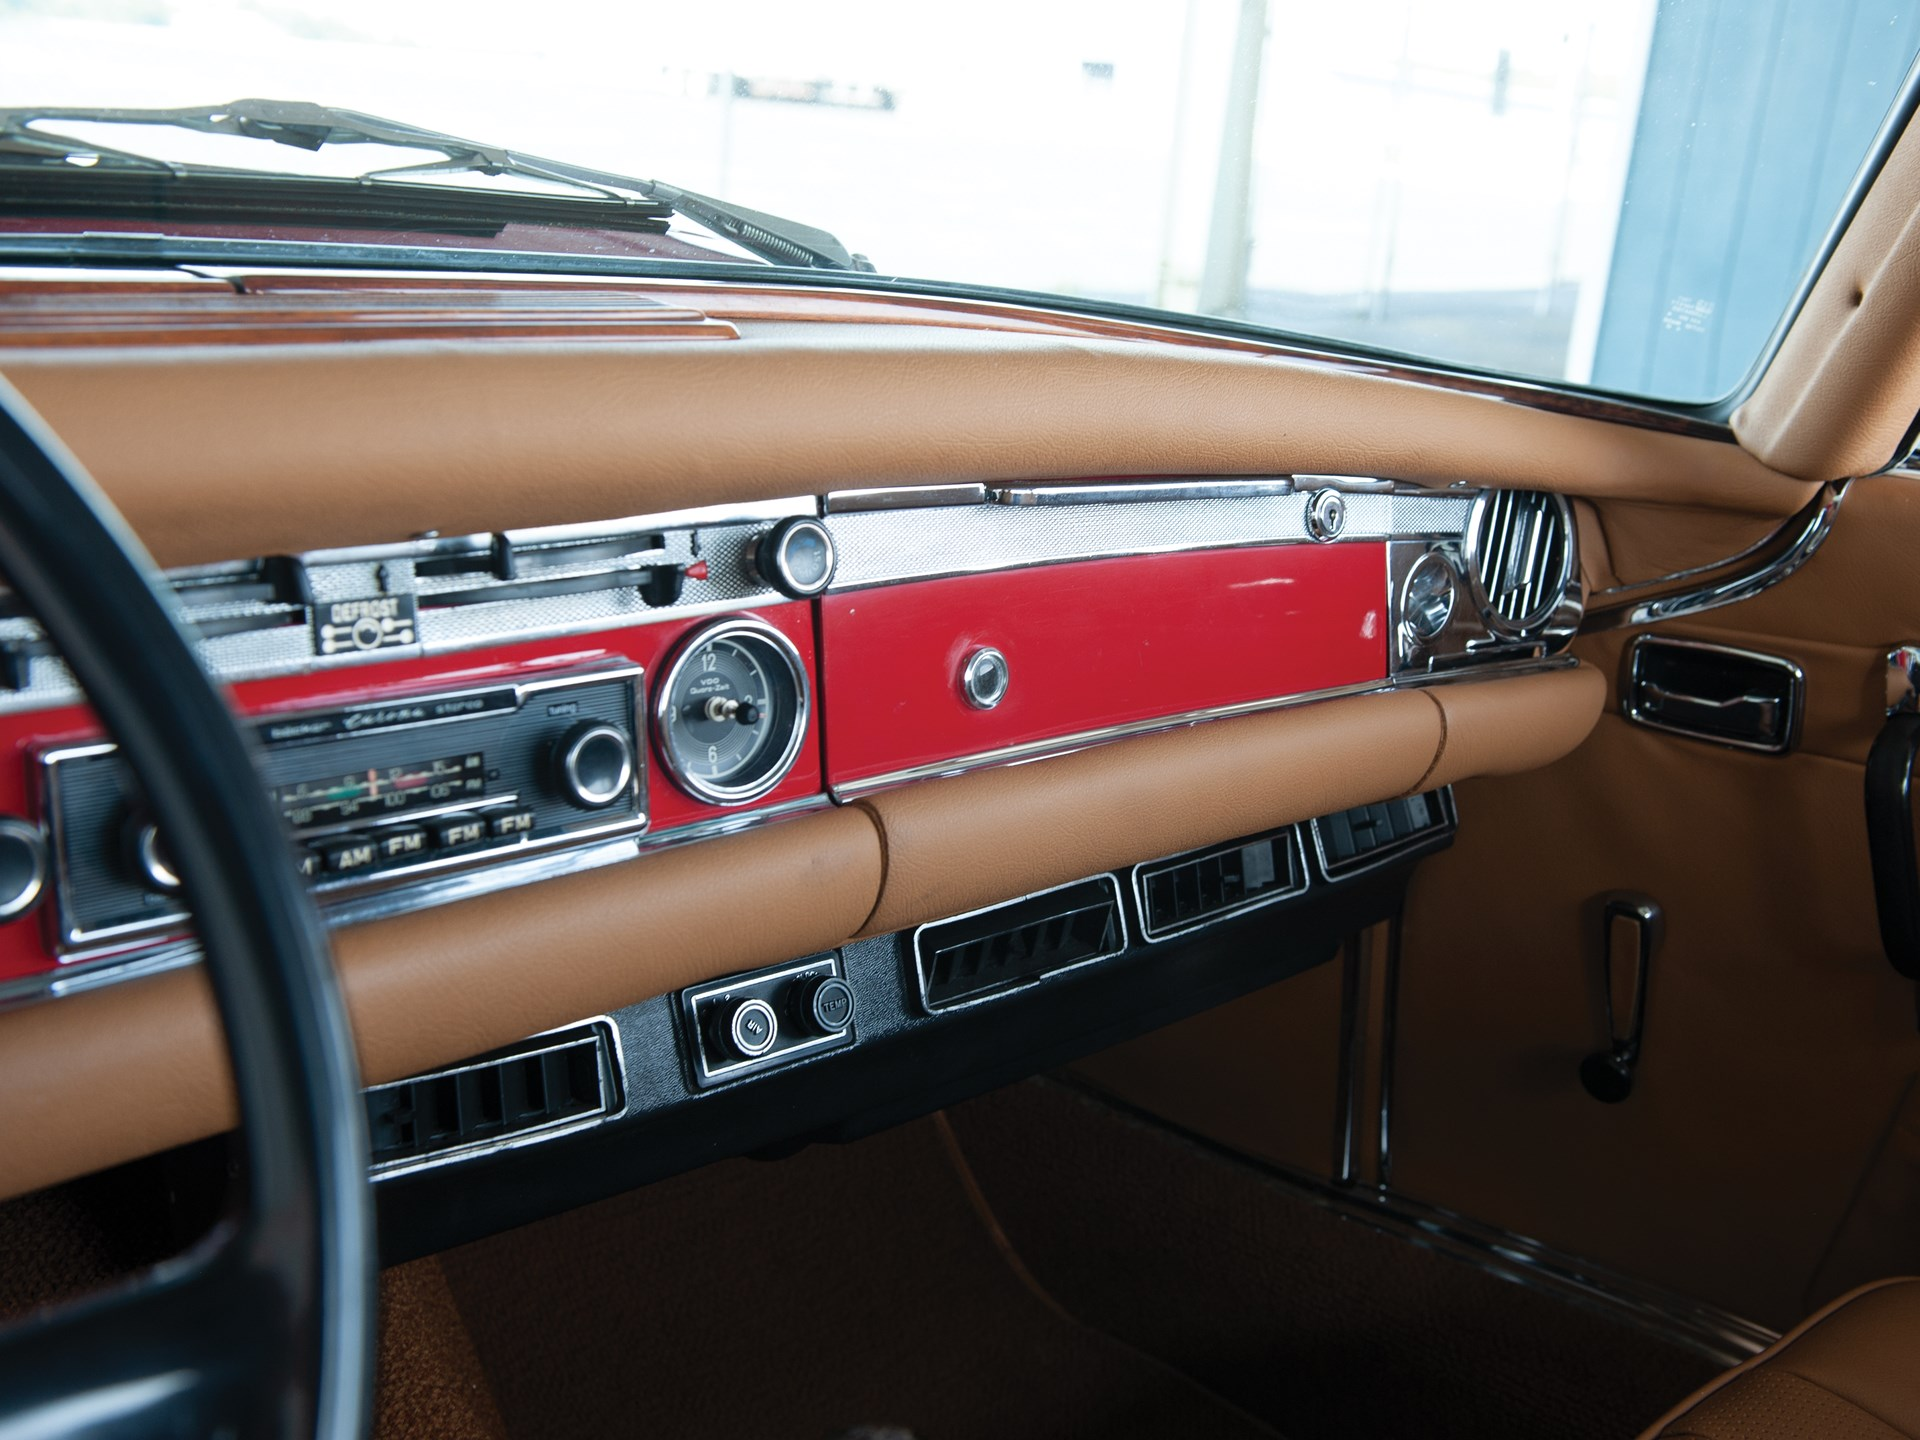 1969 Mercedes-Benz 280 SL 'Pagoda'